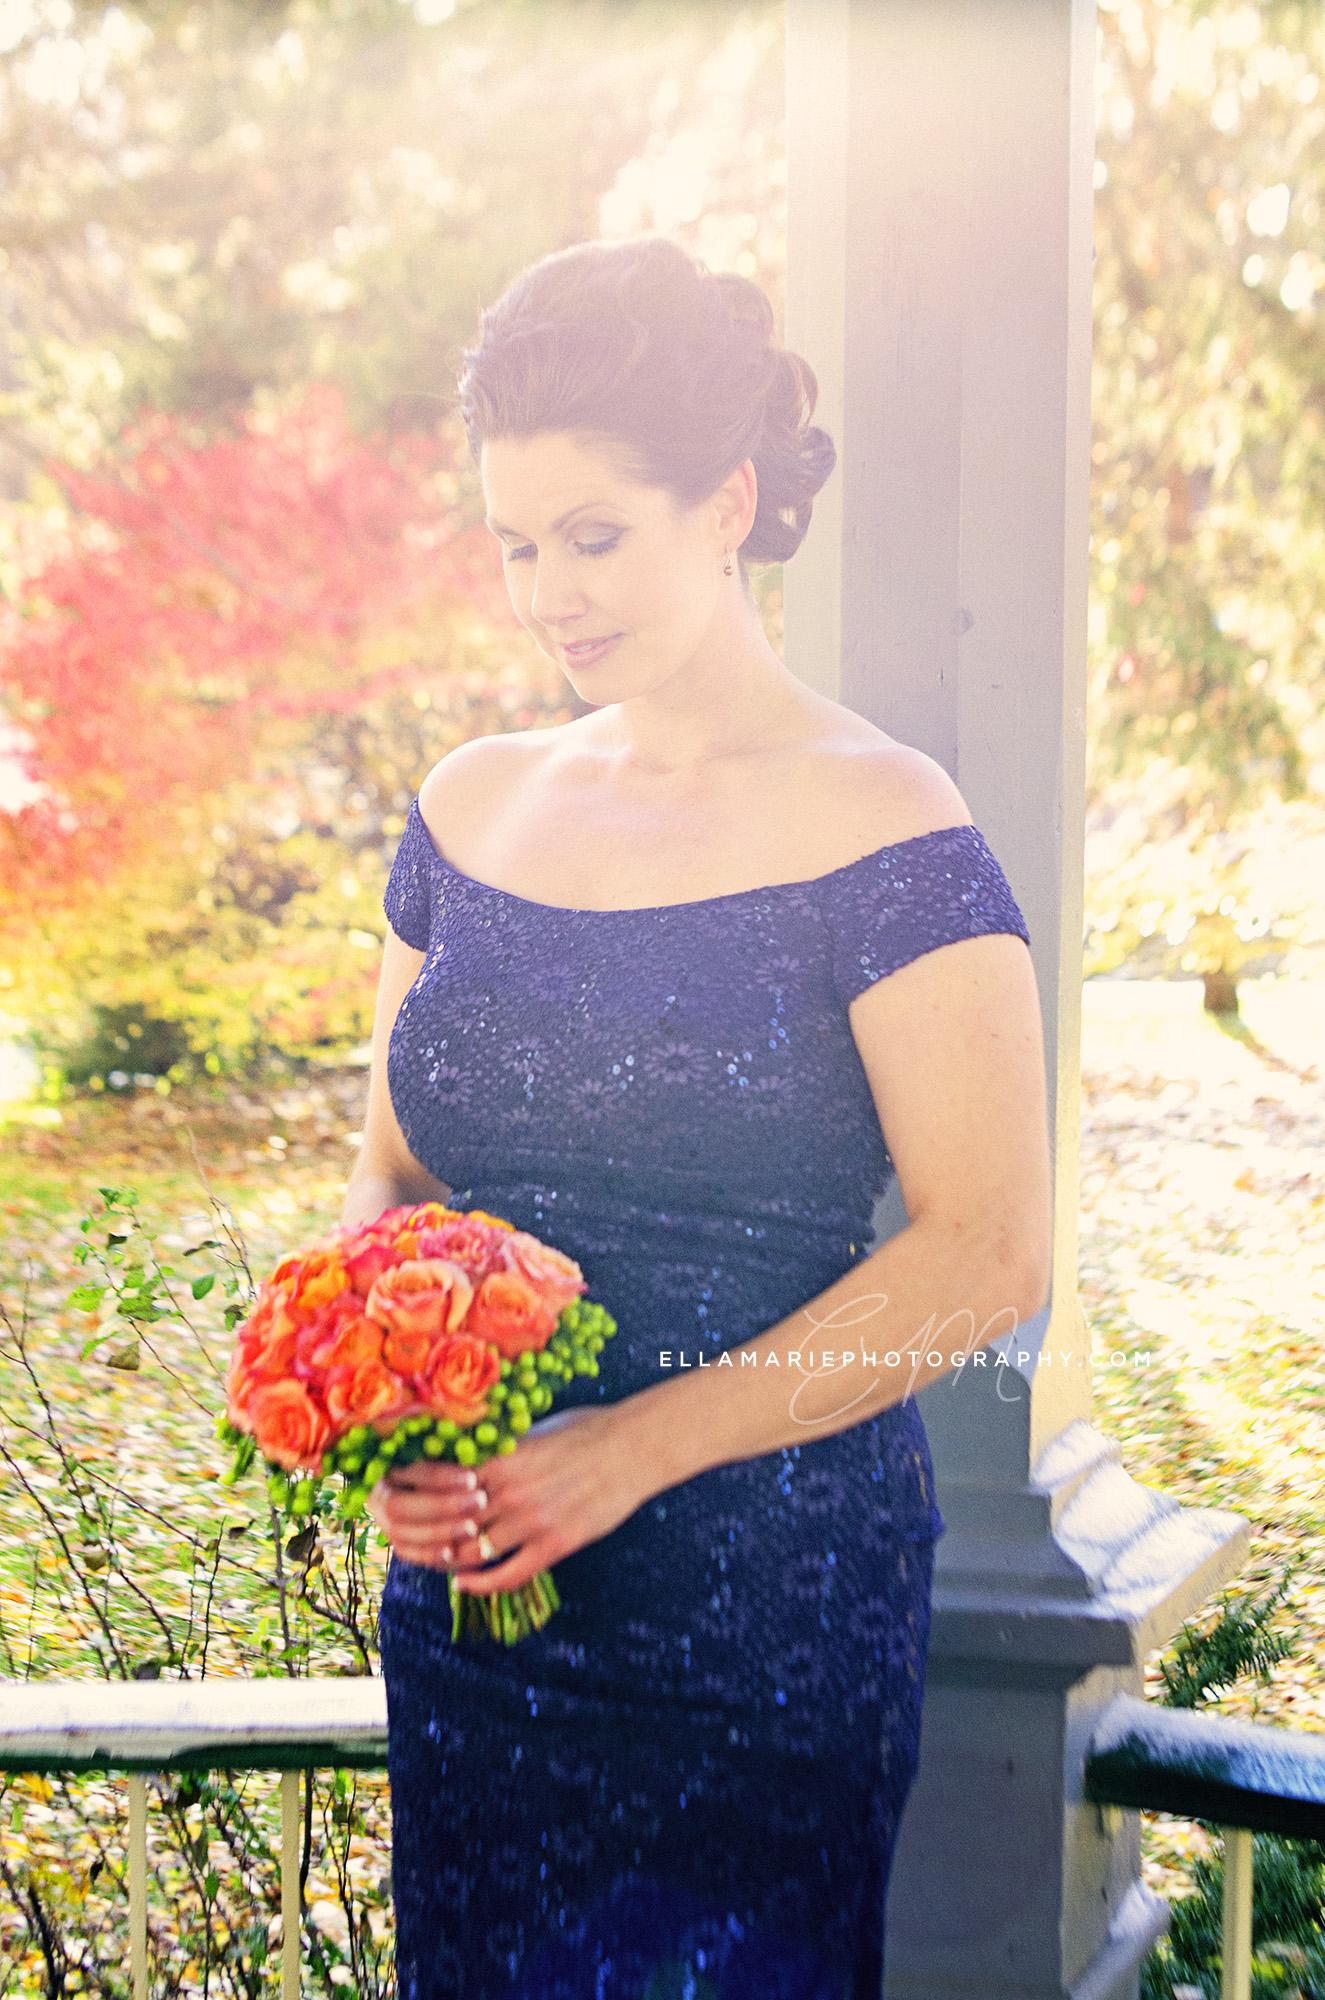 EllaMariePhotography_wedding_Baden_ON_New_Hamburg_Stratford_Waterloo_Kitchener_Guelph_Cambridge_Listowel_photographer_photography_01.jpg